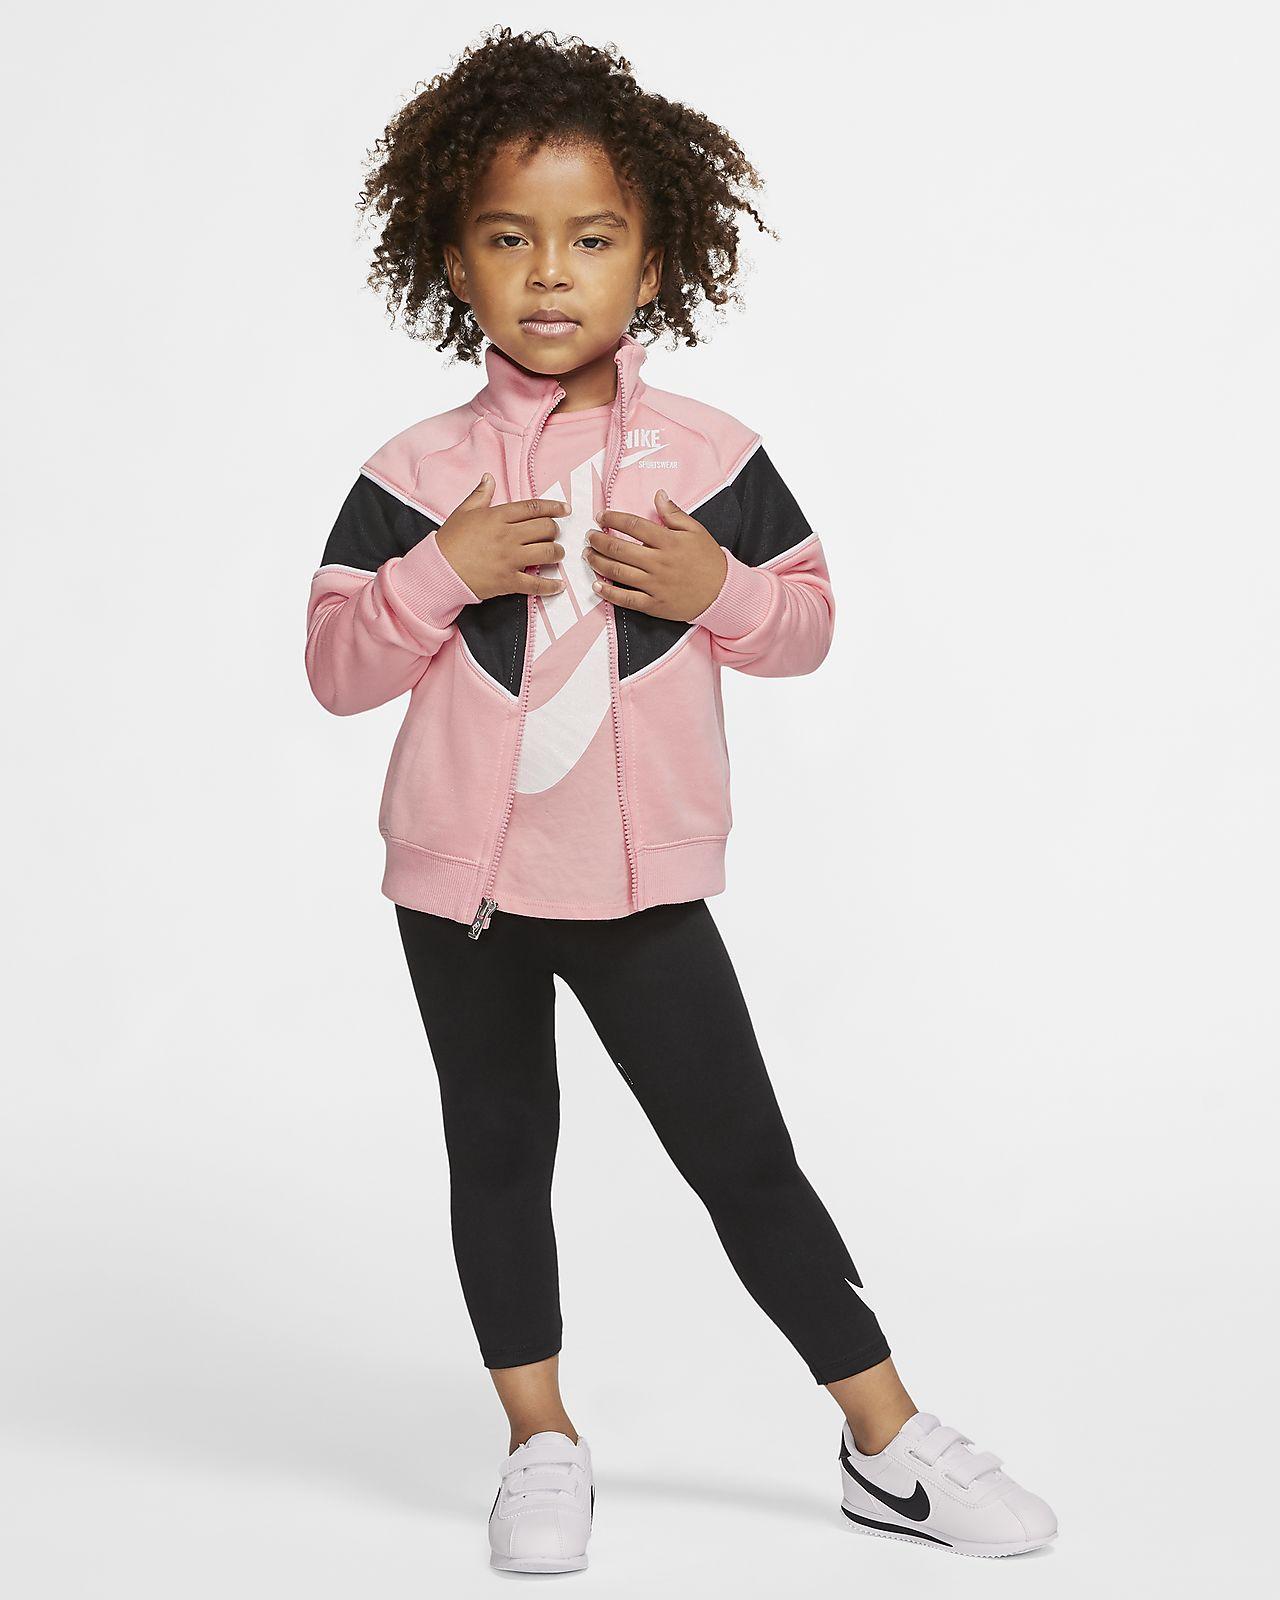 Nike Sportswear Toddler Full Zip Jacket